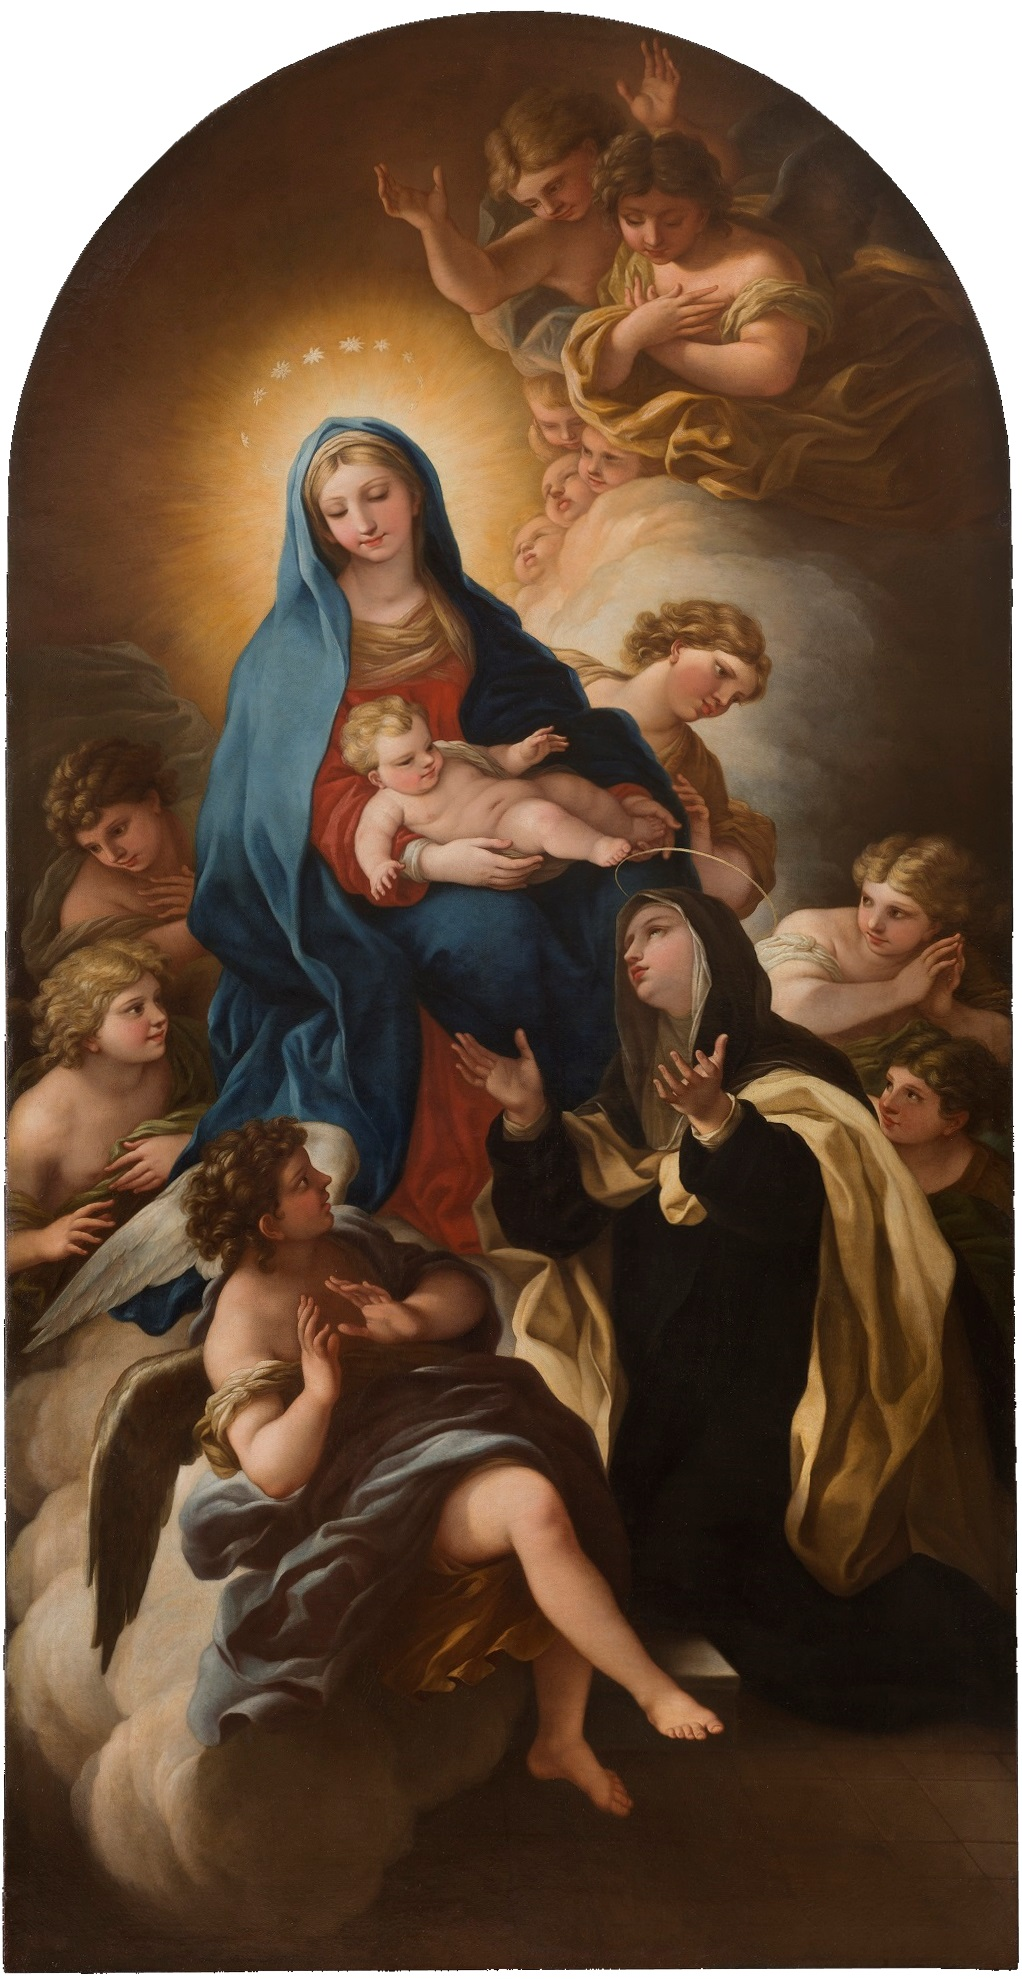 La Vergine Maria Presenta Gesù Bambino a Santa Maria Maddalena de' Pazzi